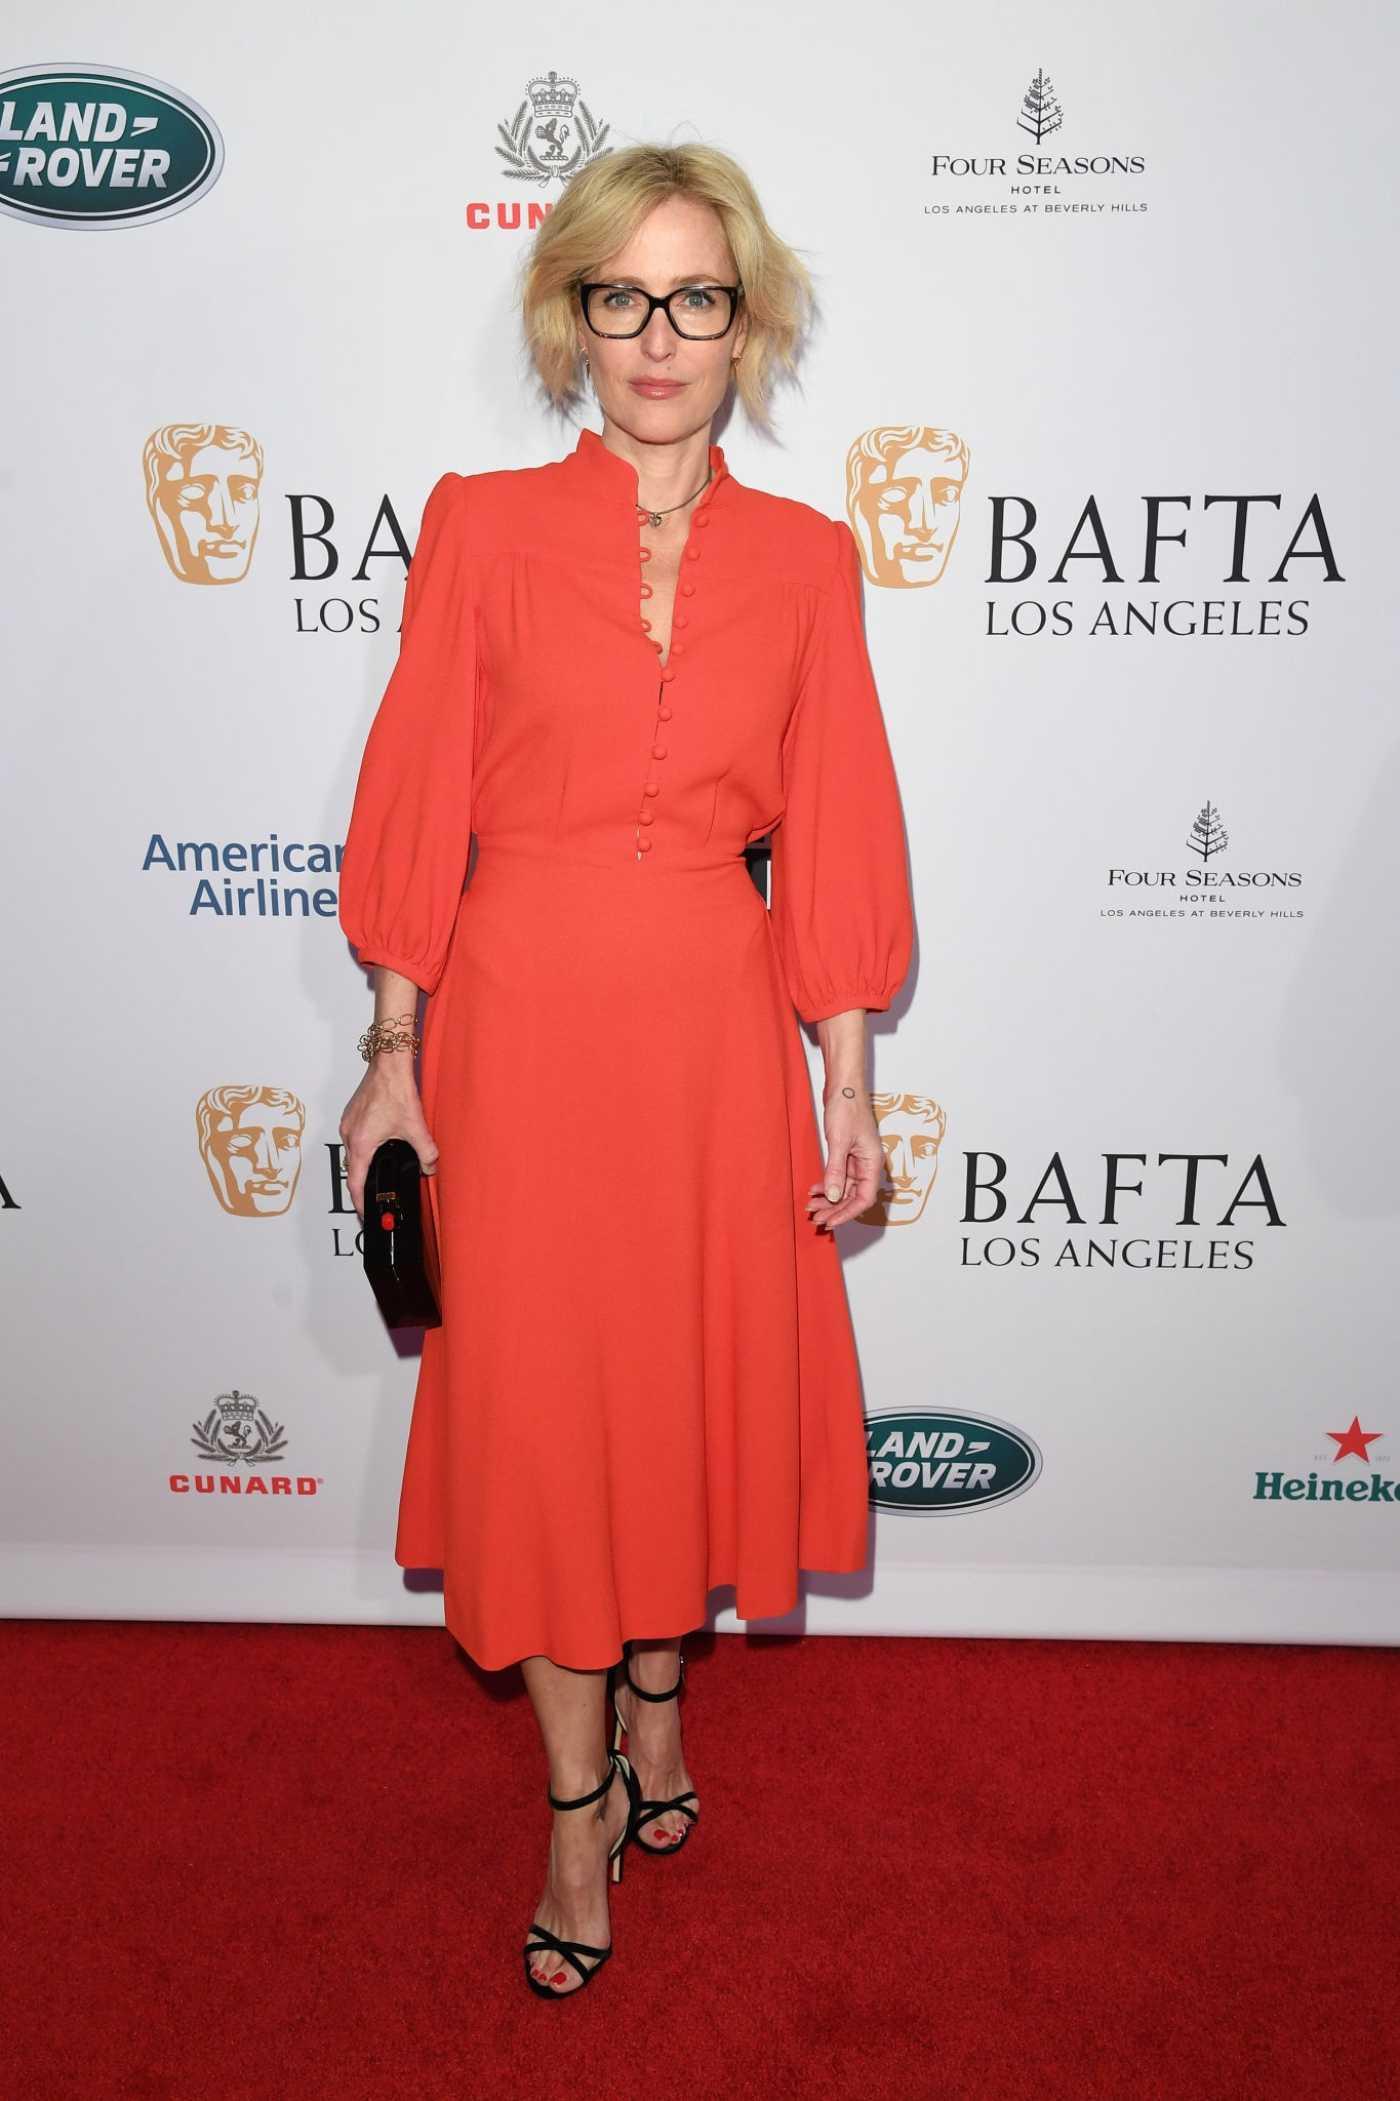 Gillian Anderson Attends the BAFTA Los Angeles Tea Party in Los Angeles 04/01/2020